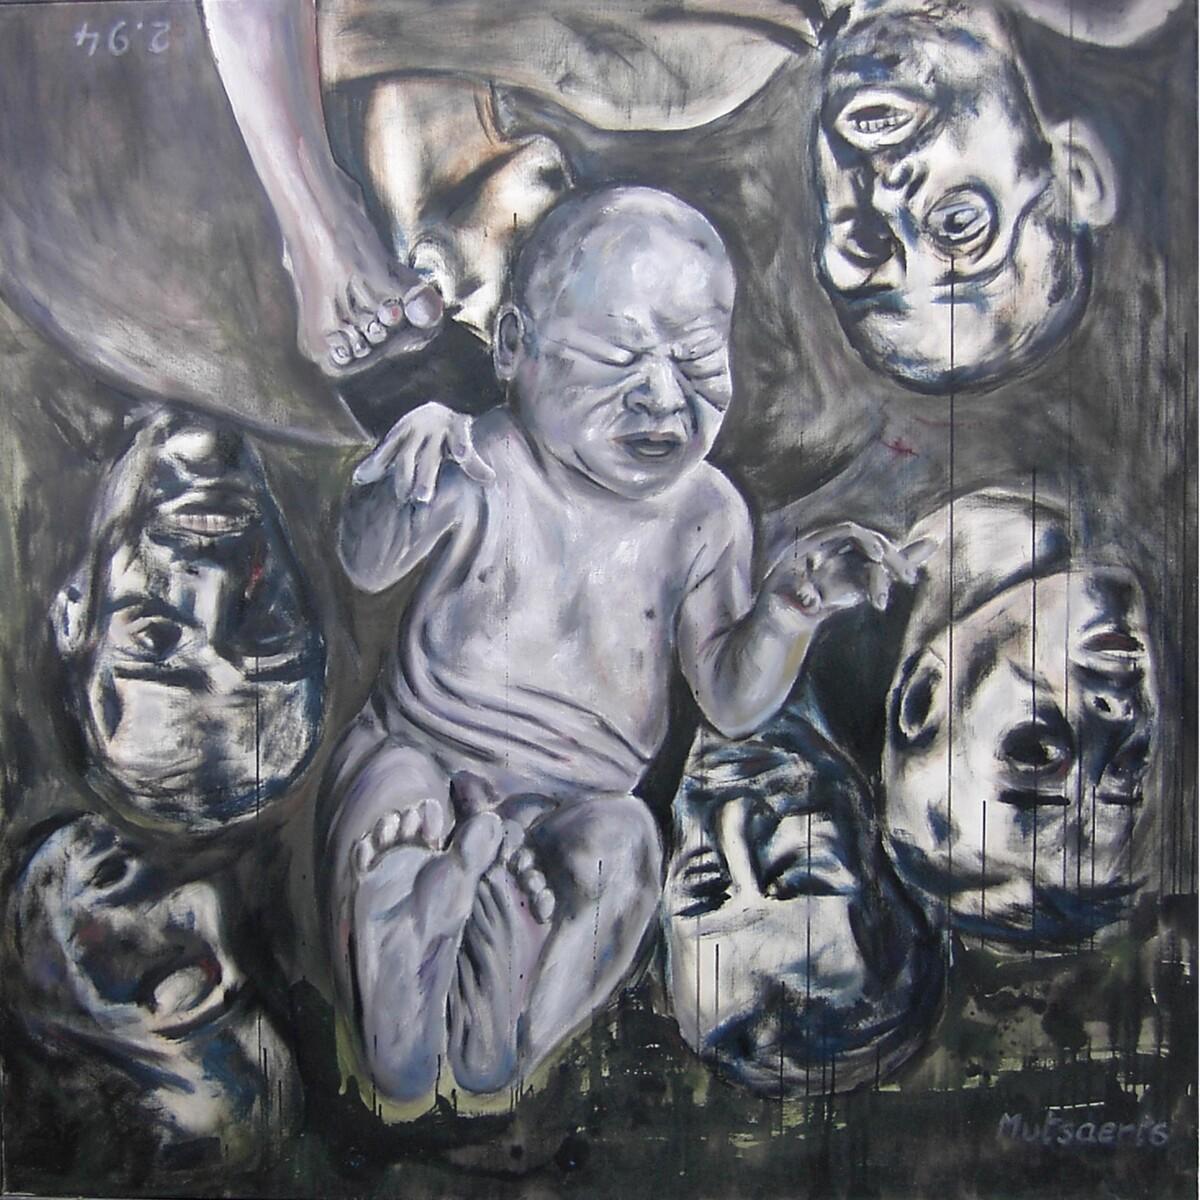 1994.2, oil on canvas, 150*150 cm - Dirk Mutsaerts